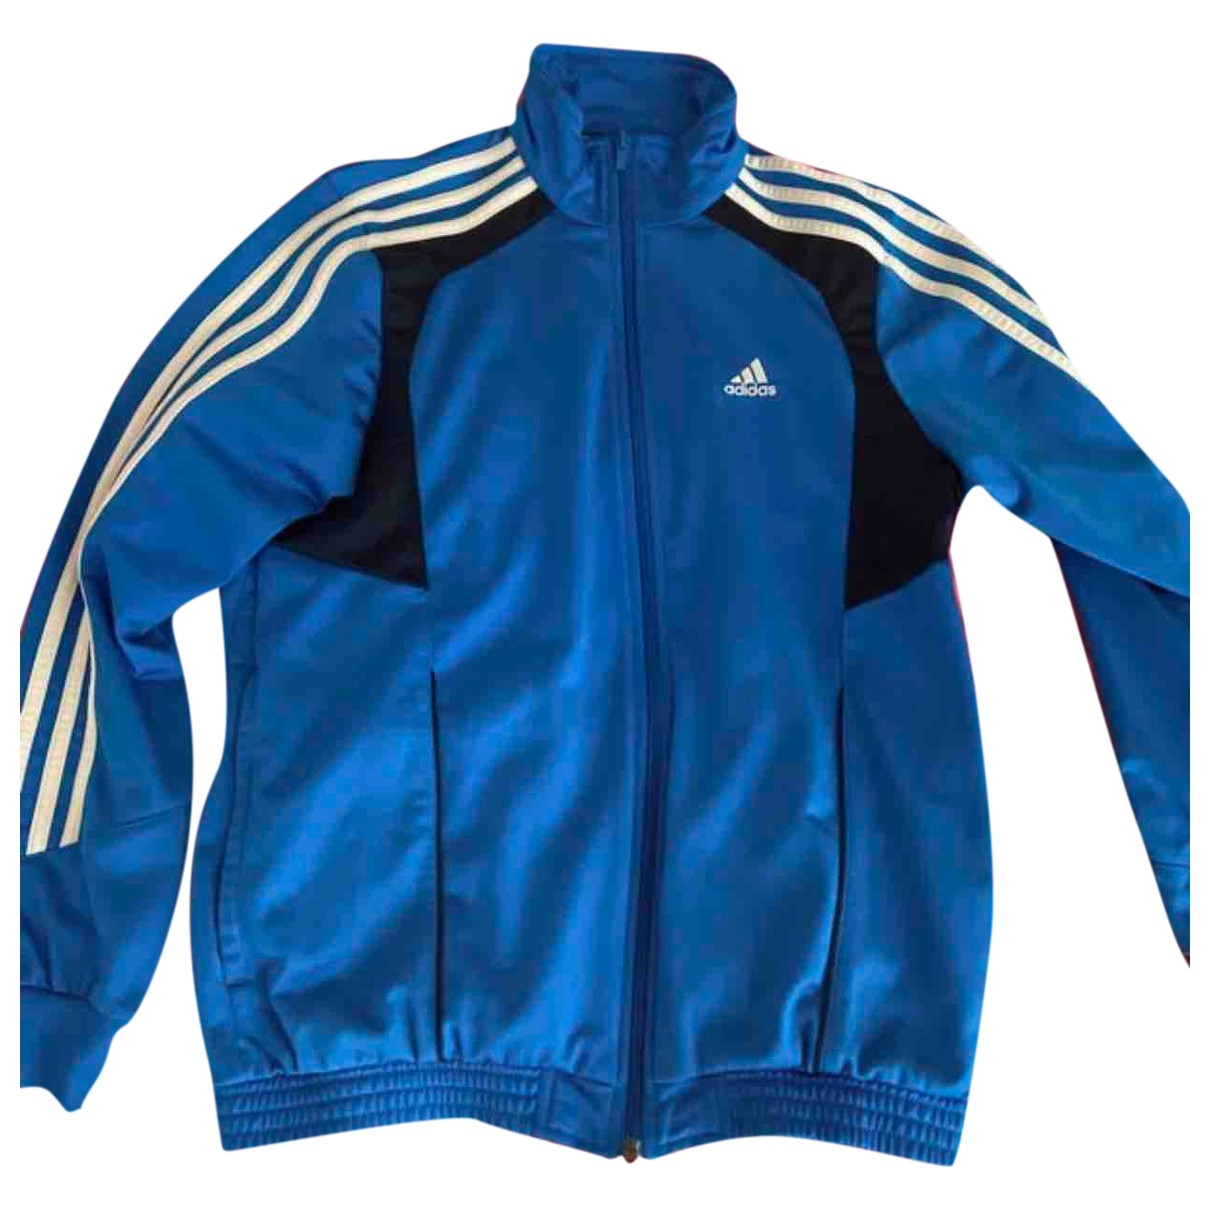 Adidas \N Jacke in  Blau Baumwolle